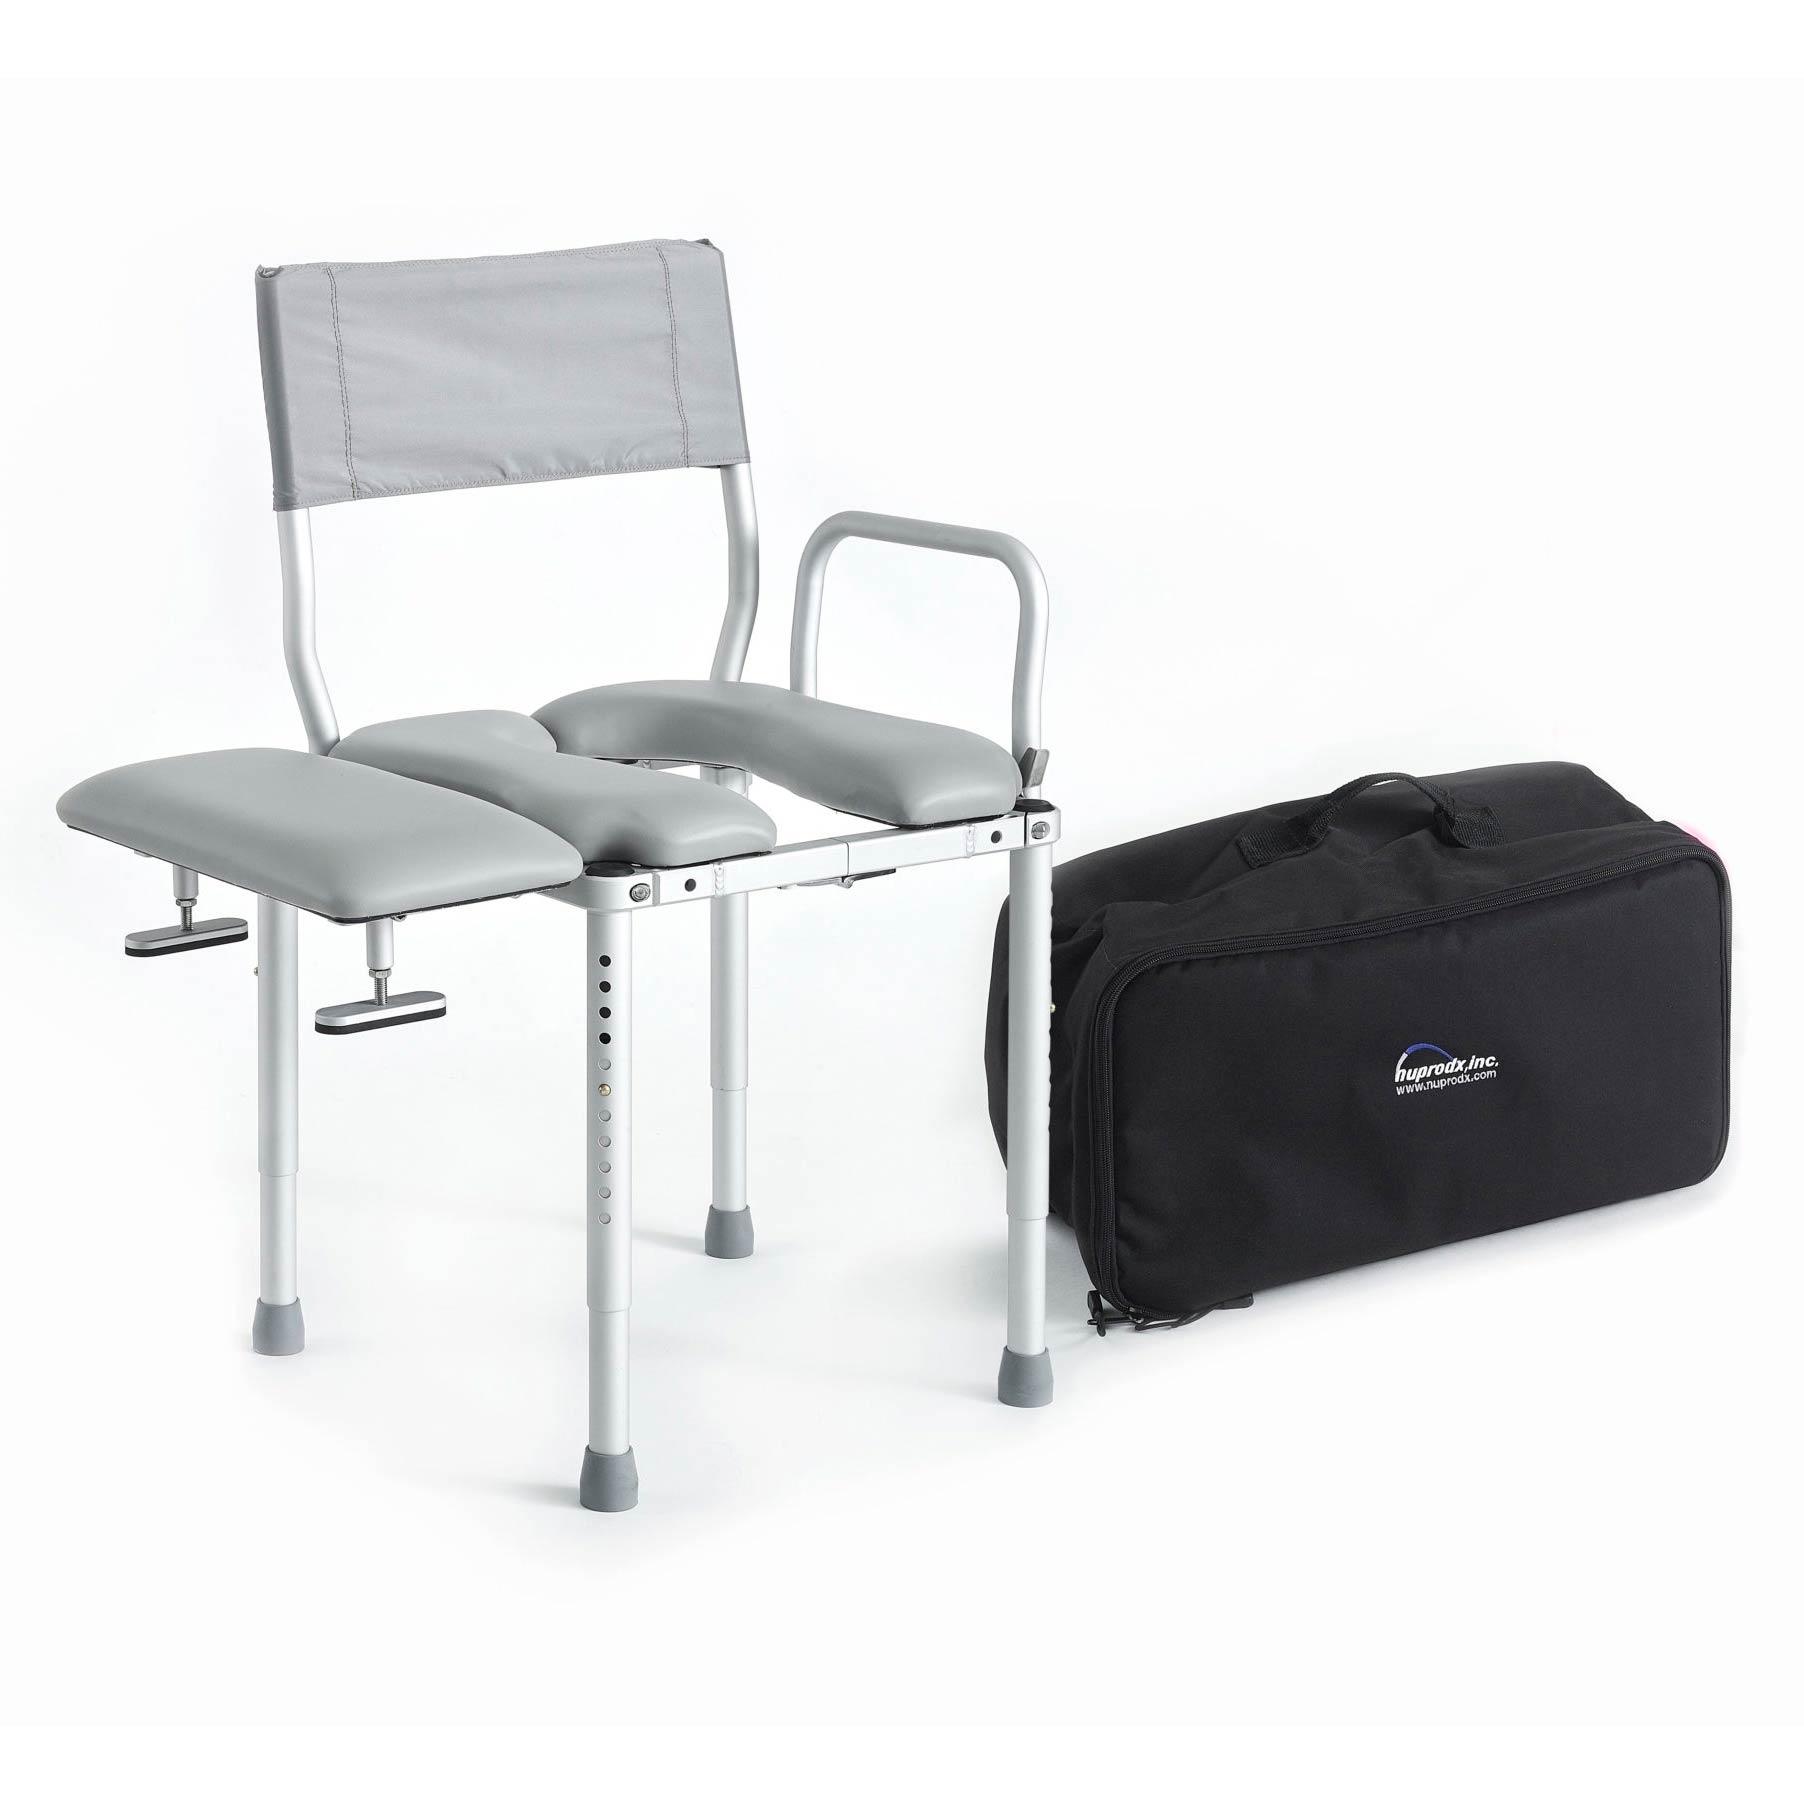 Nuprodx Multichair 3000Tx Tub & Toilet Chair